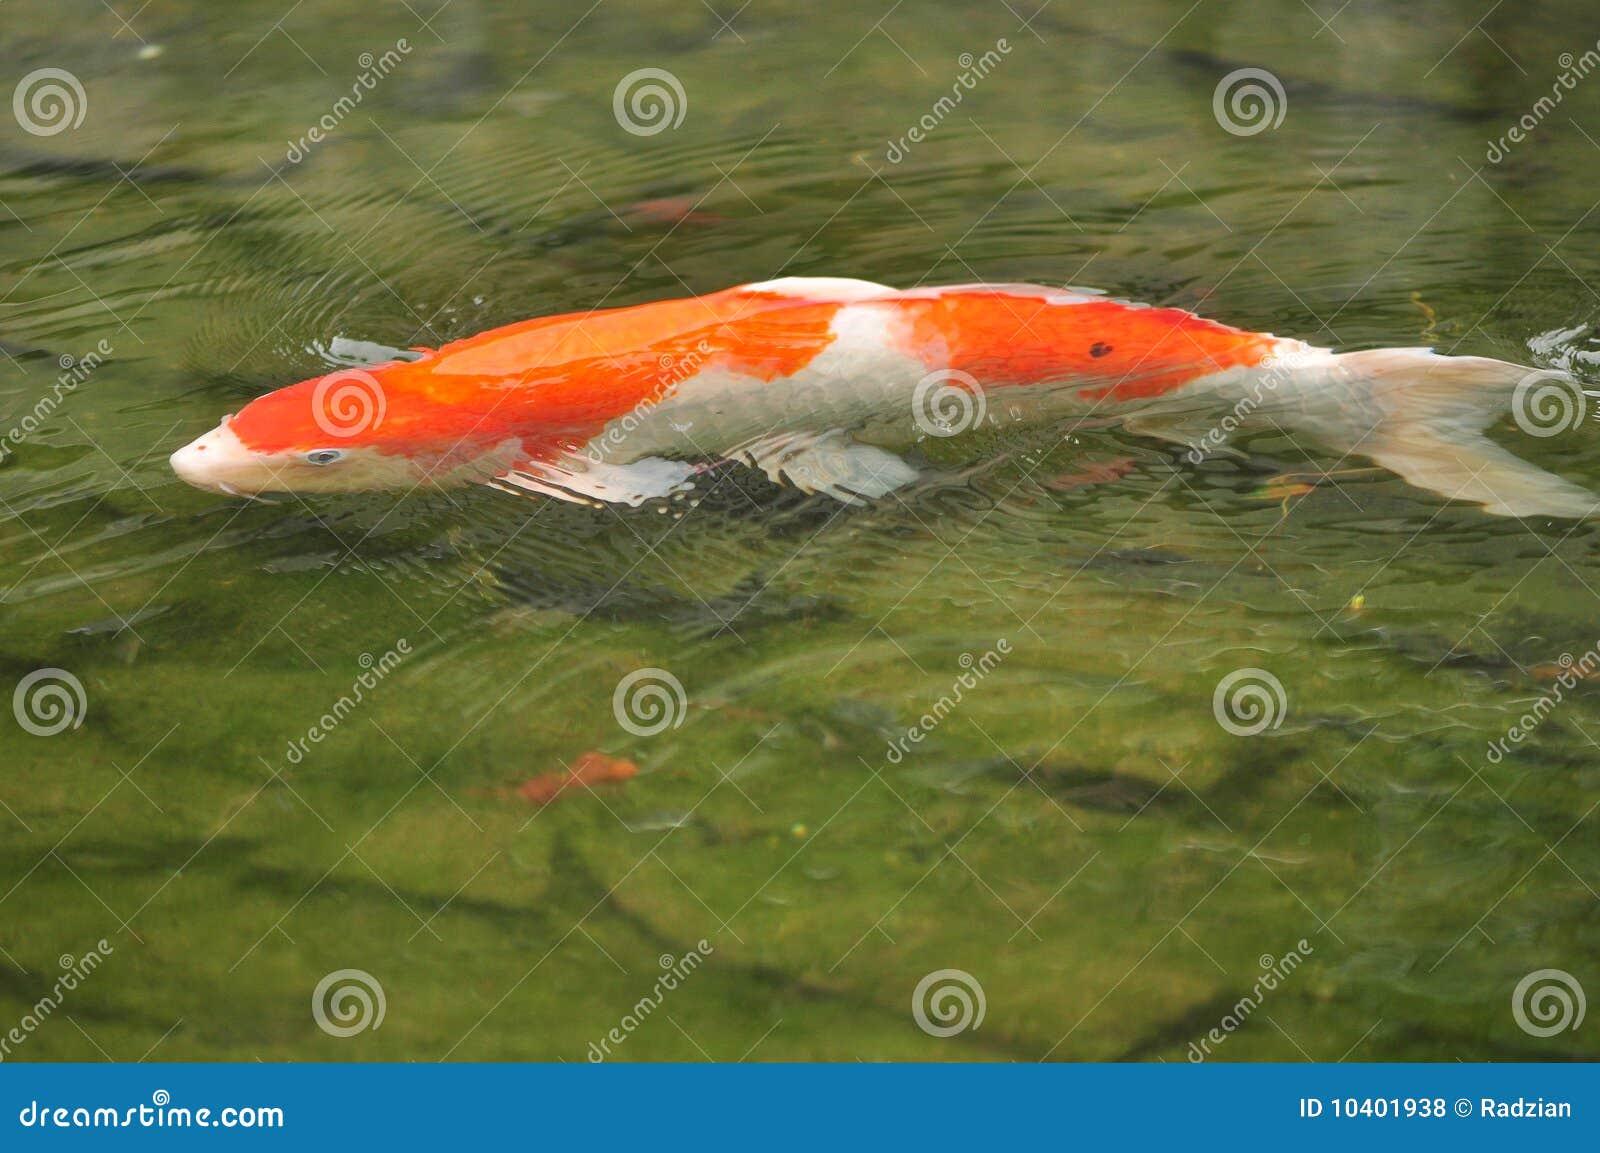 Koi carp fish stock photo image of pads single green for Japanese koi carp